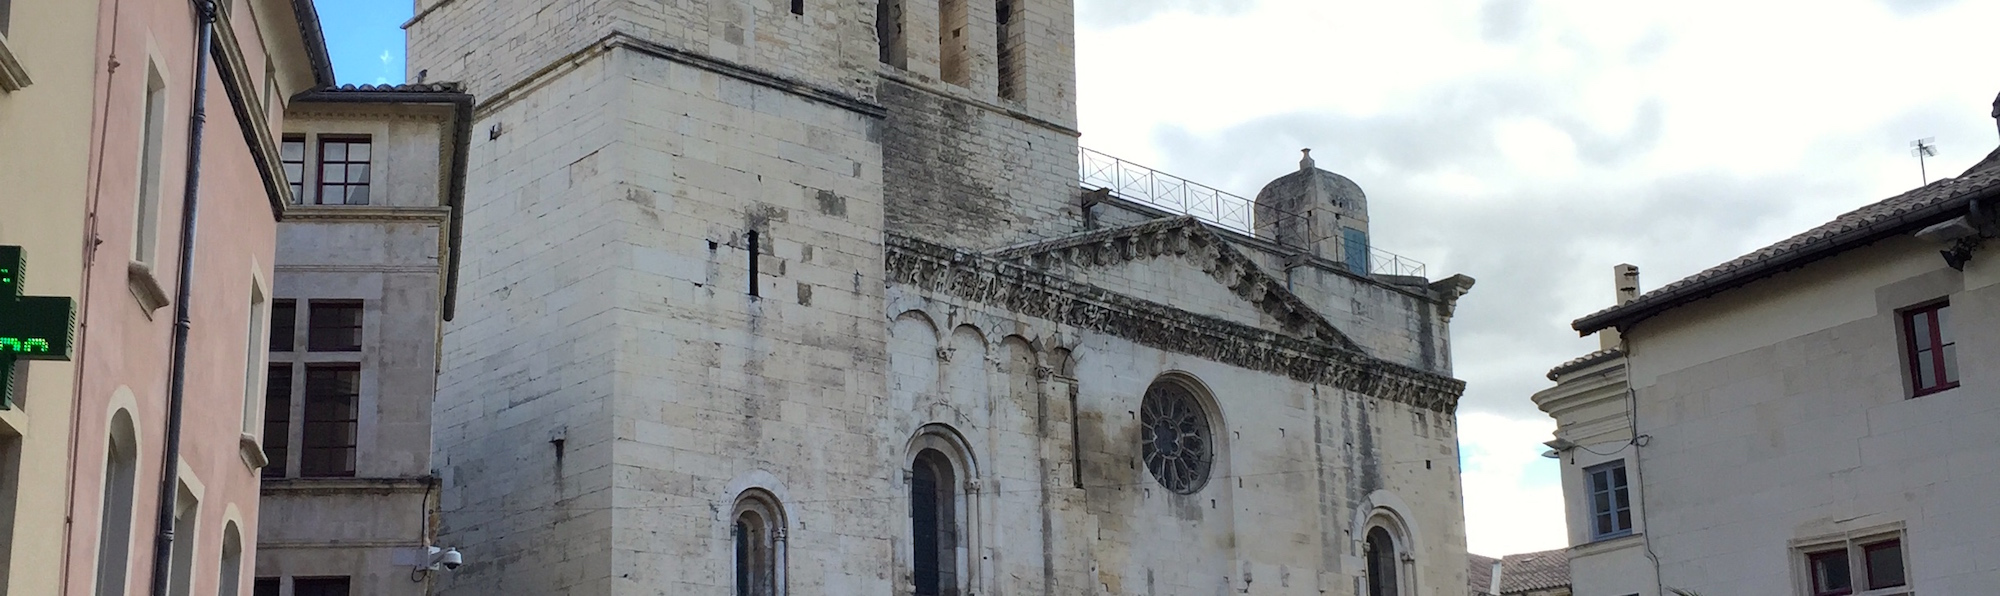 Catedral de Nimes